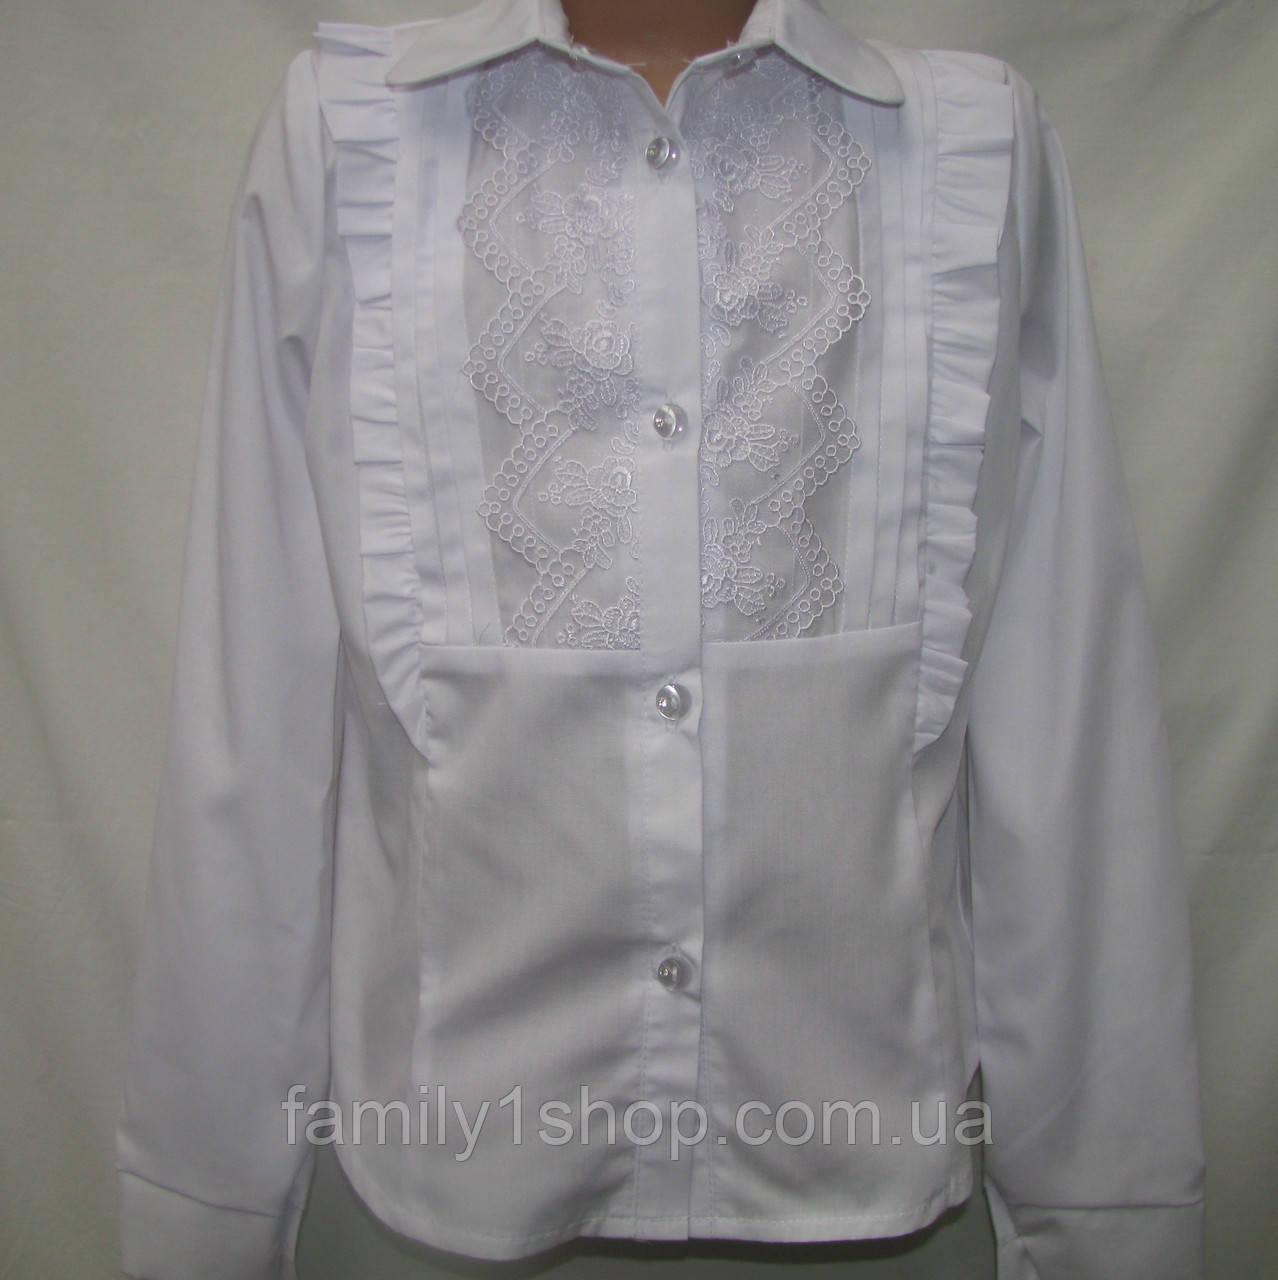 4d158f79ab9 Школьная белая блузка для девочки.  продажа